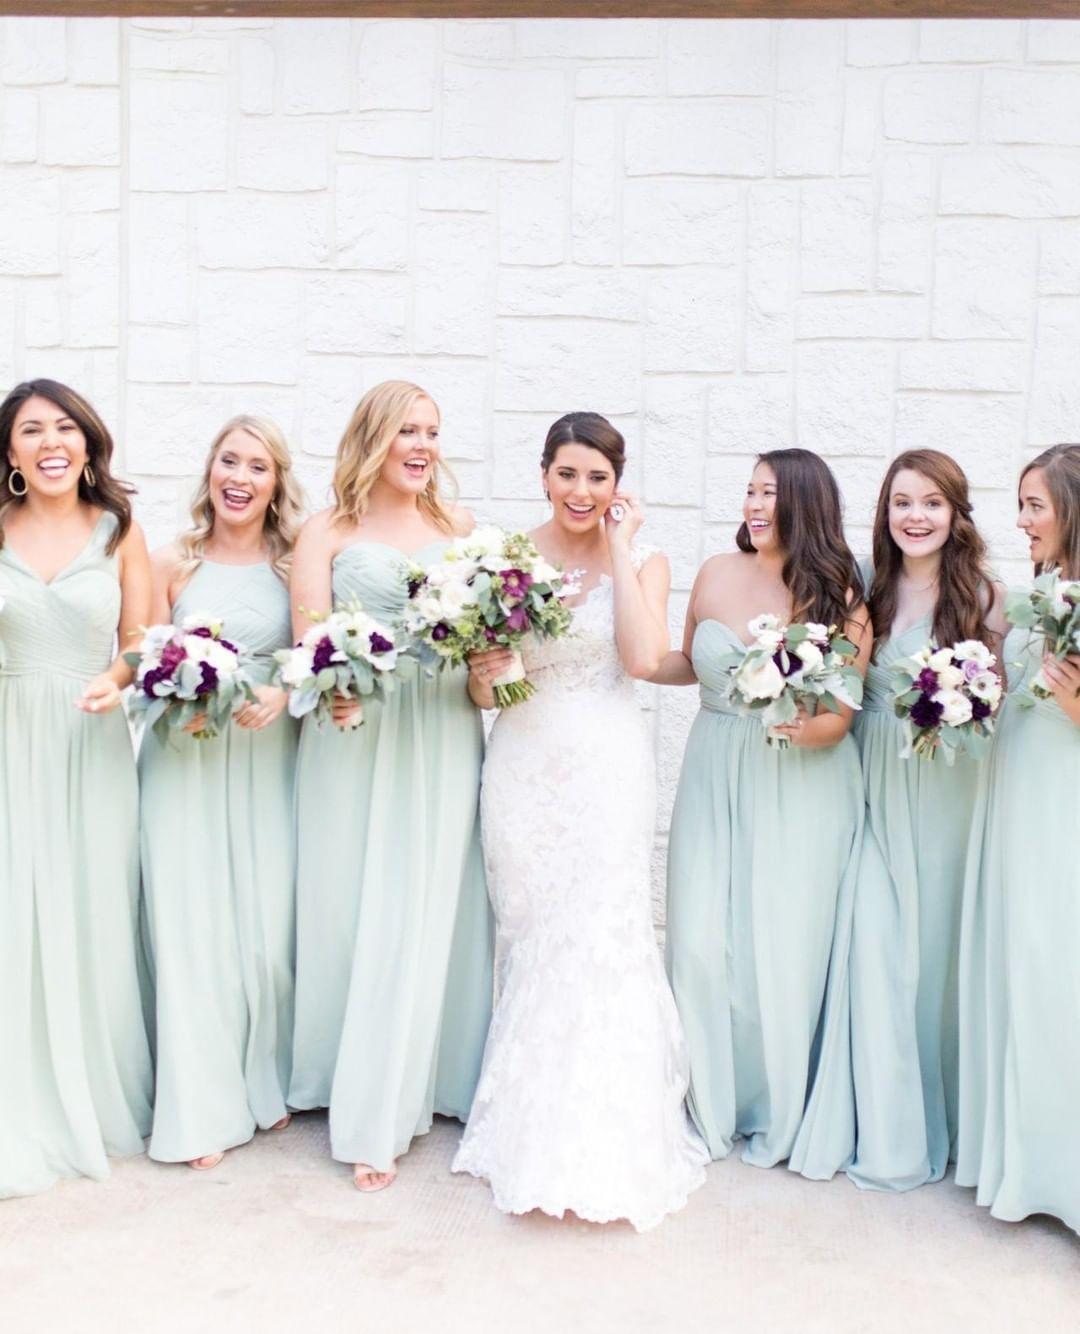 Dusty Sage Bridesmaid Dresses Sage Bridesmaid Dresses Bridesmaid Dresses Dusty Sage Wedding Dress Pictures